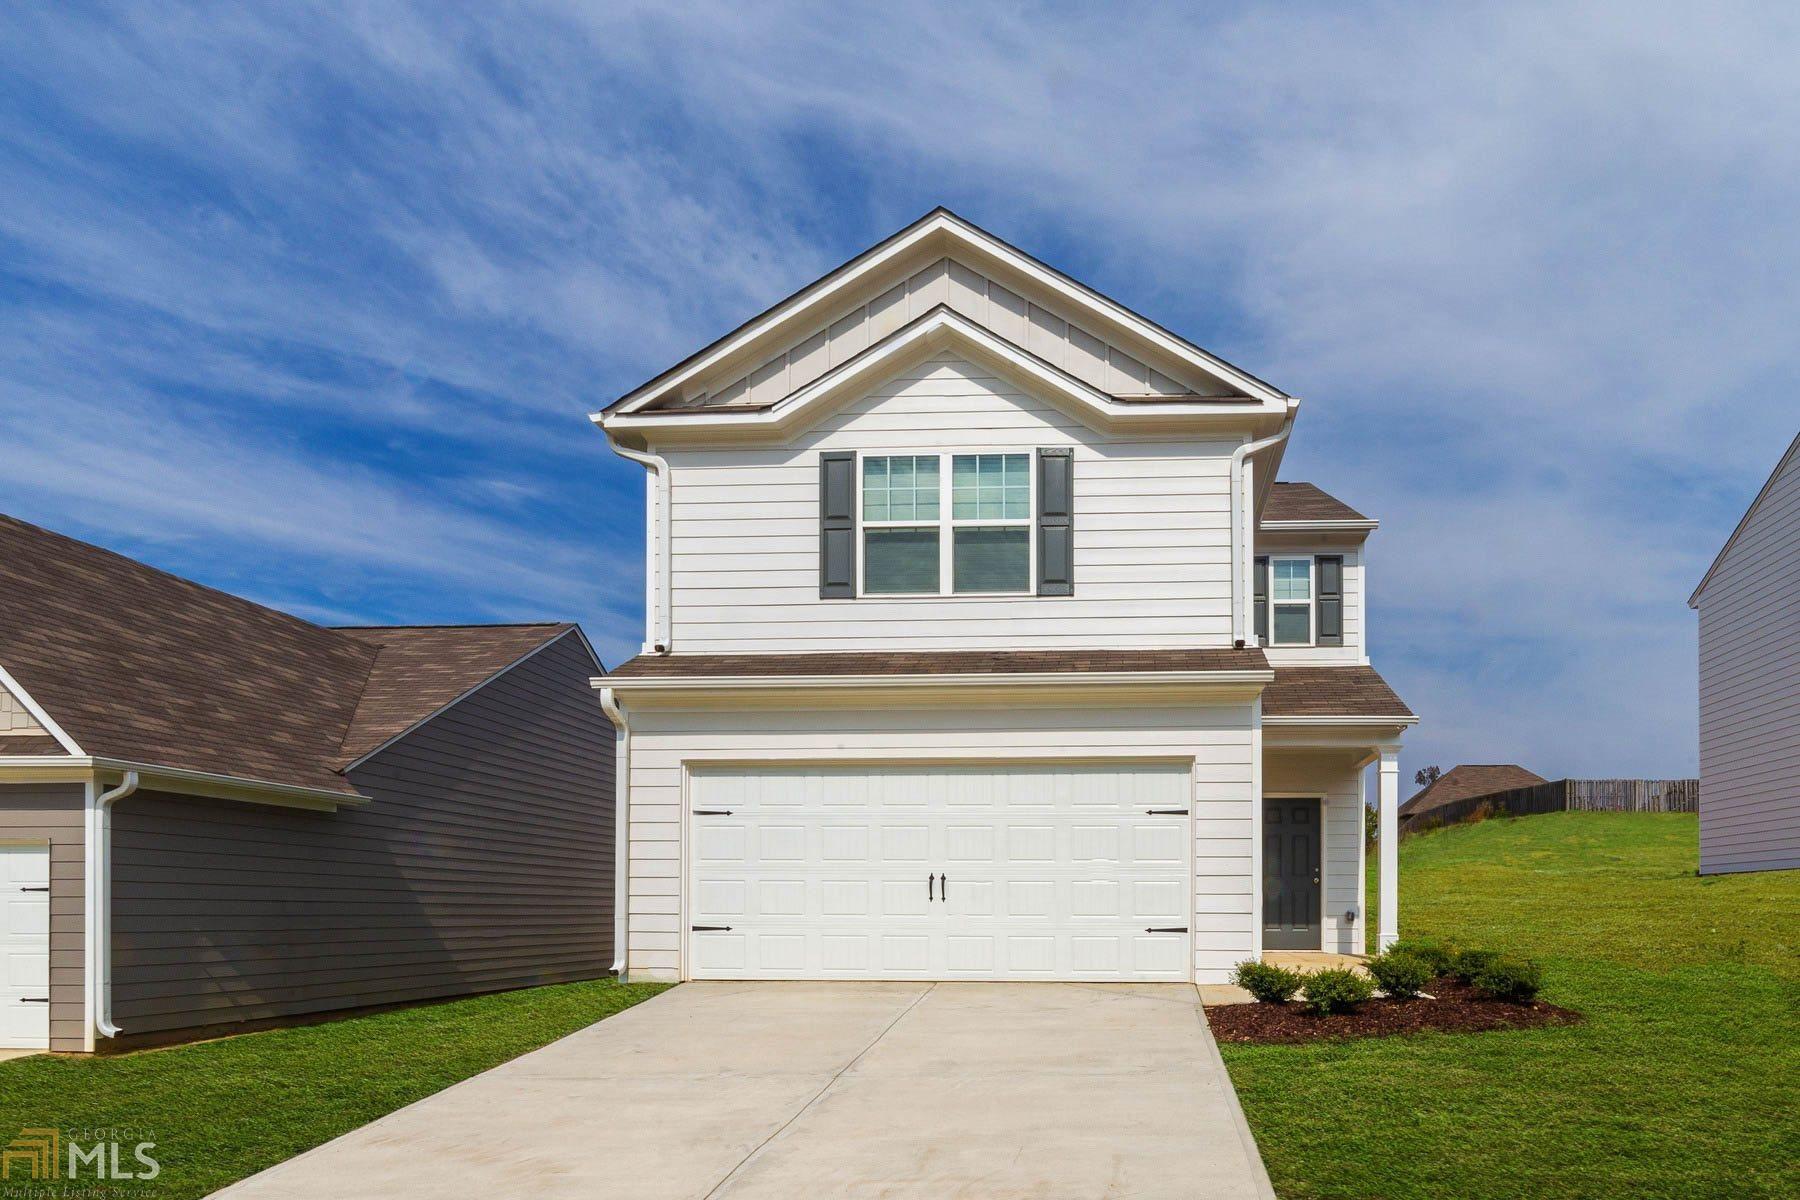 106 Cypress Pt, Cartersville, GA 30120 - MLS#: 8878432